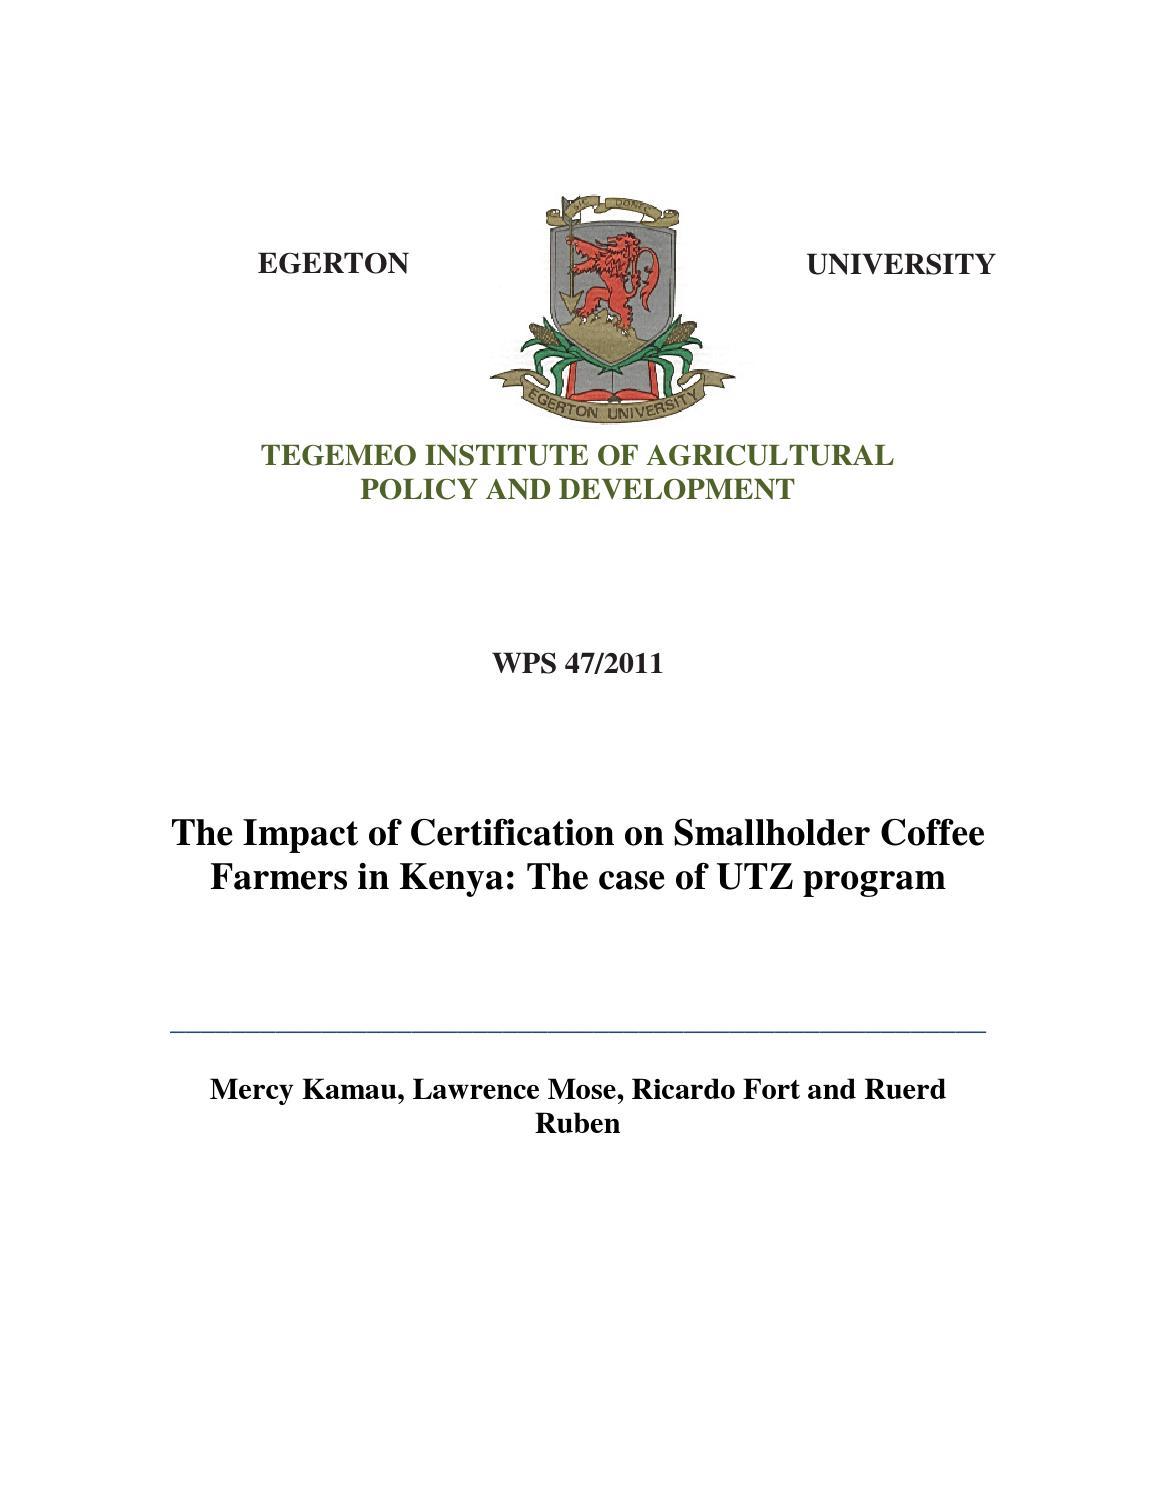 The Impact Of Certification On Smallholder Coffee Farmers In Kenya